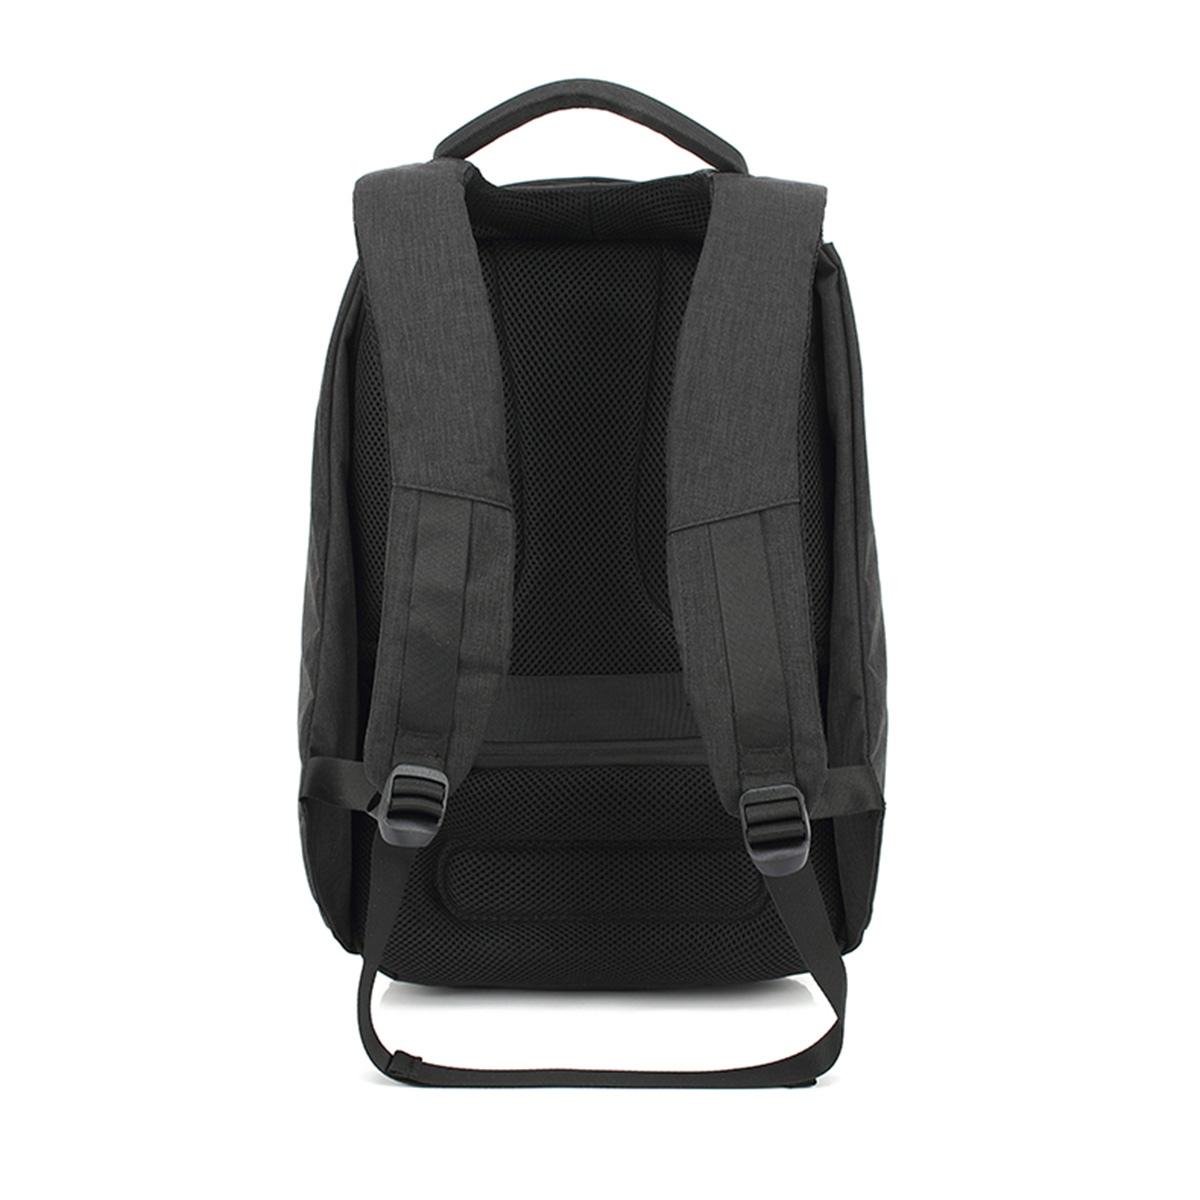 df2fe873f4 Σακίδιο Πλάτης Αντικλεπτικό Ozuko Anti Theft Laptop Backpack 8798 Μαύρο